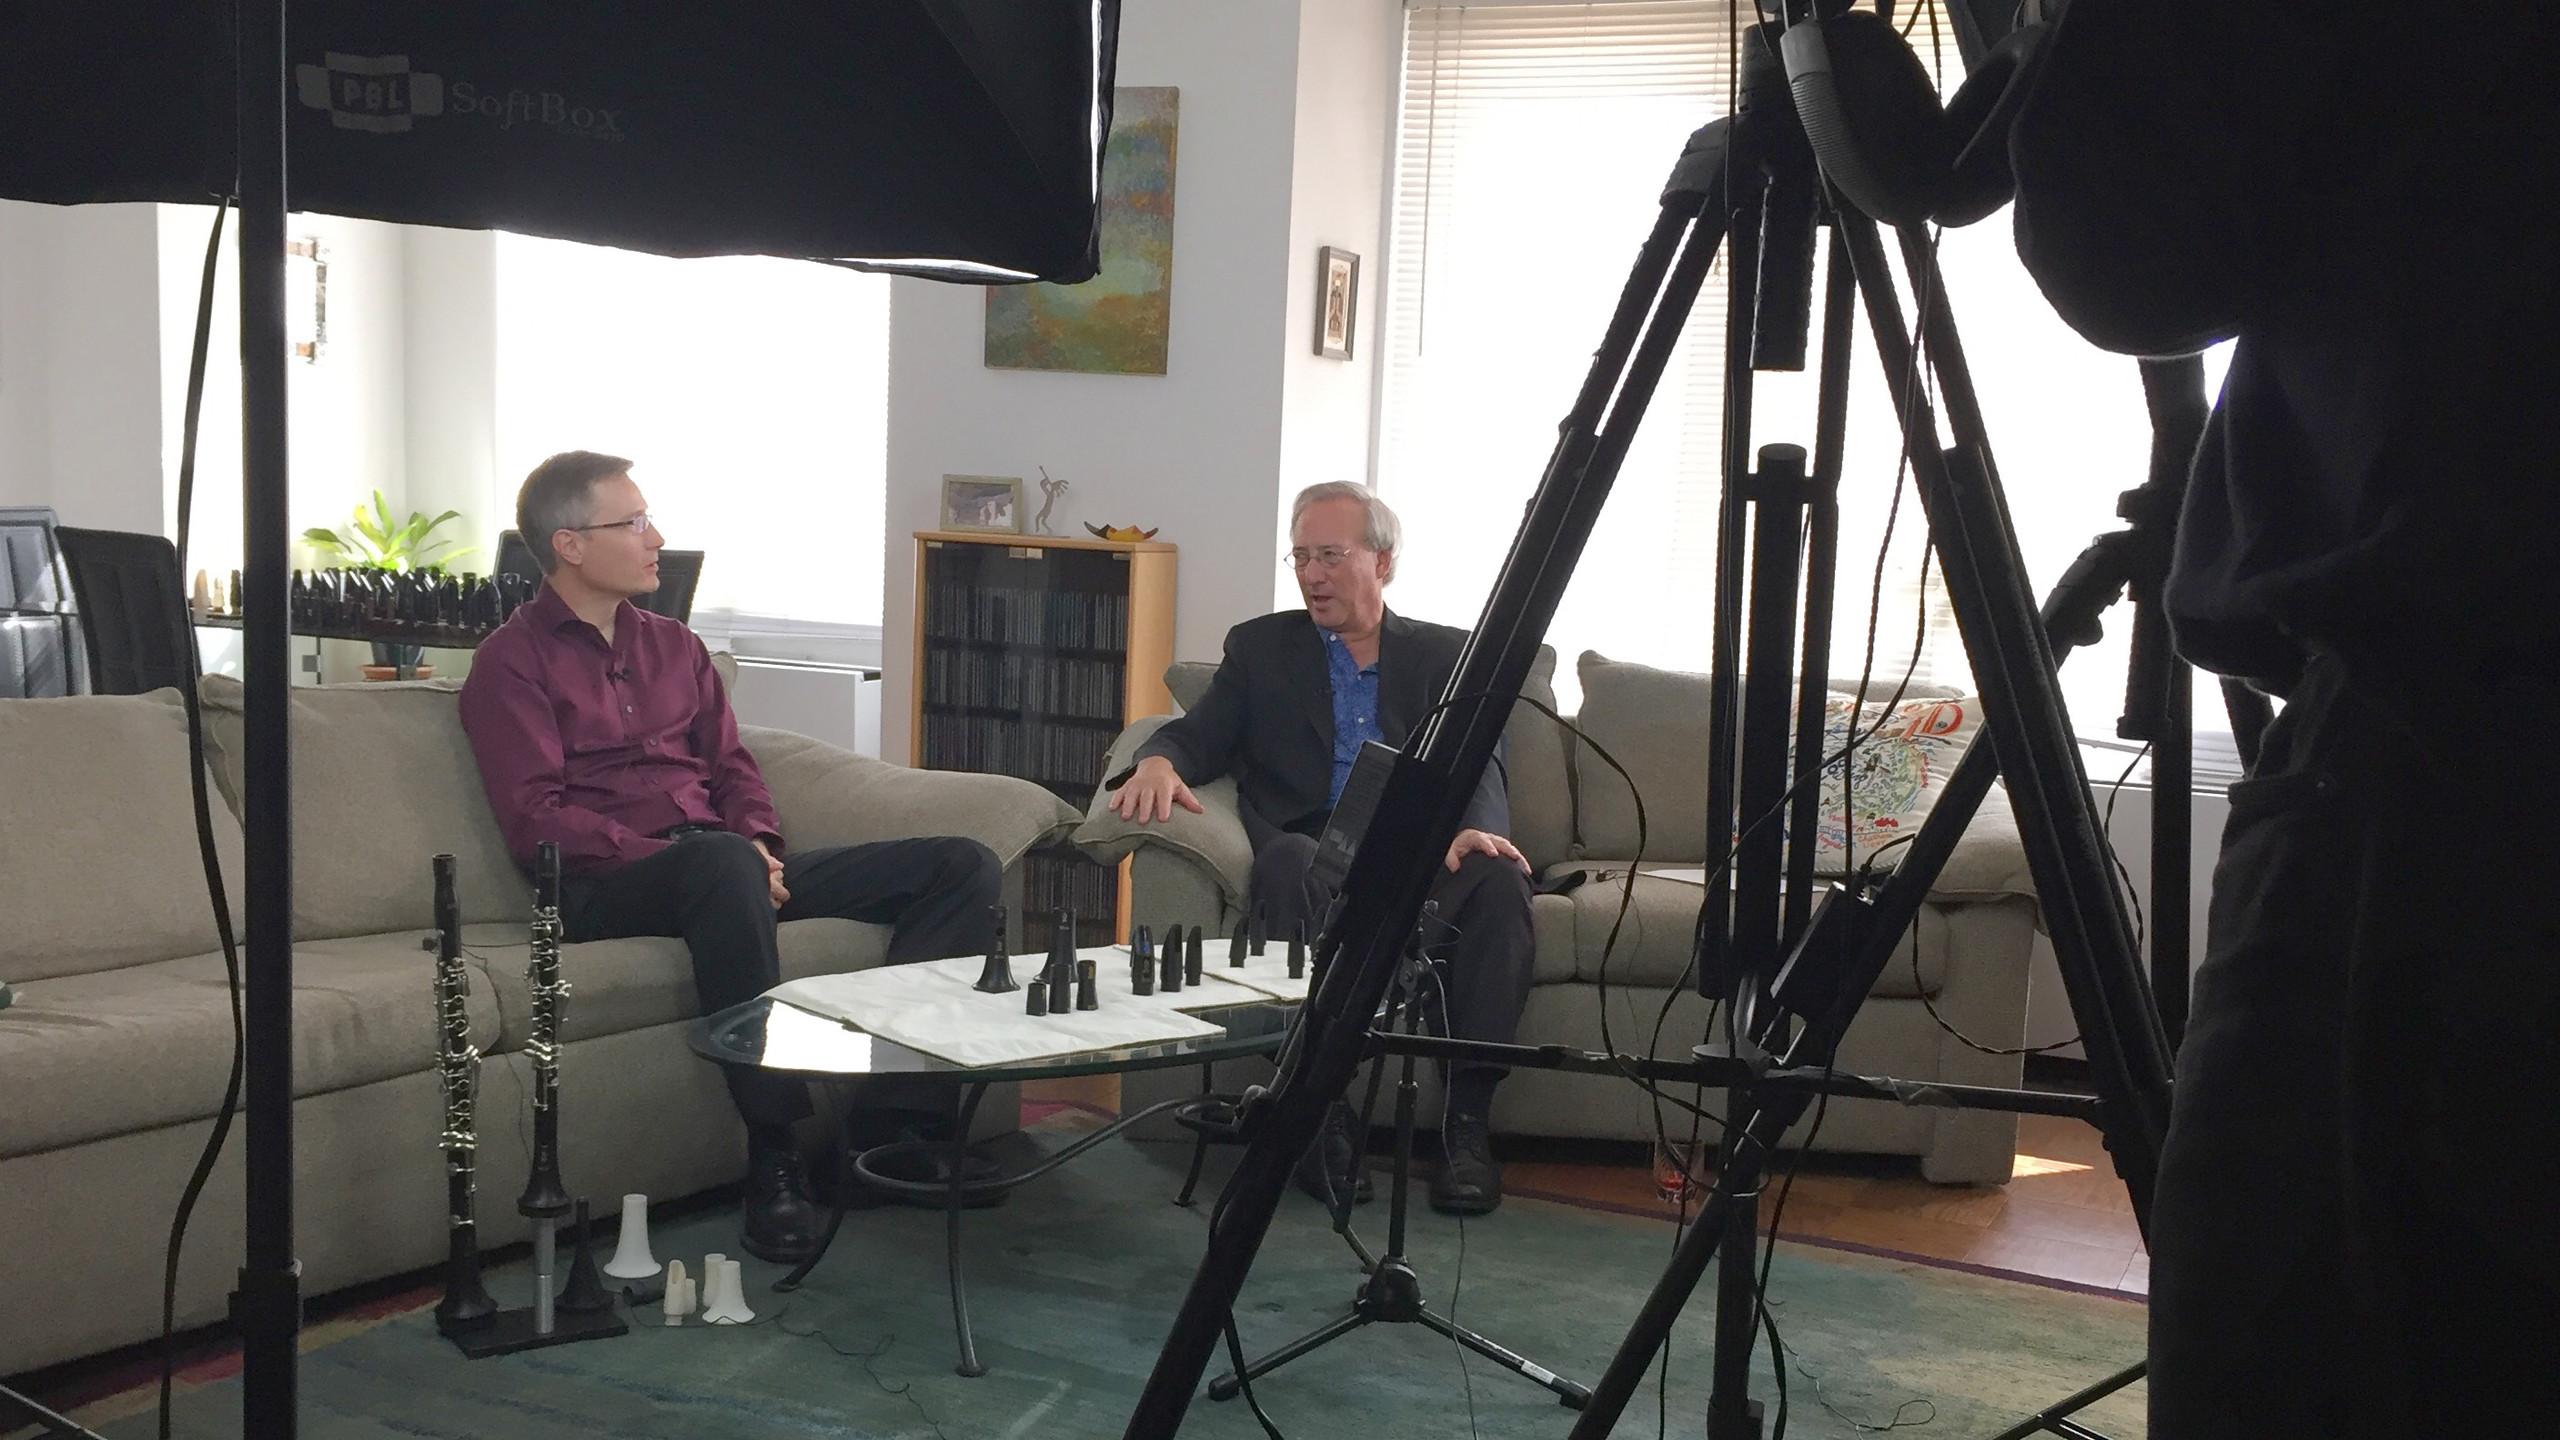 Brad interviewed by Ed Joffe